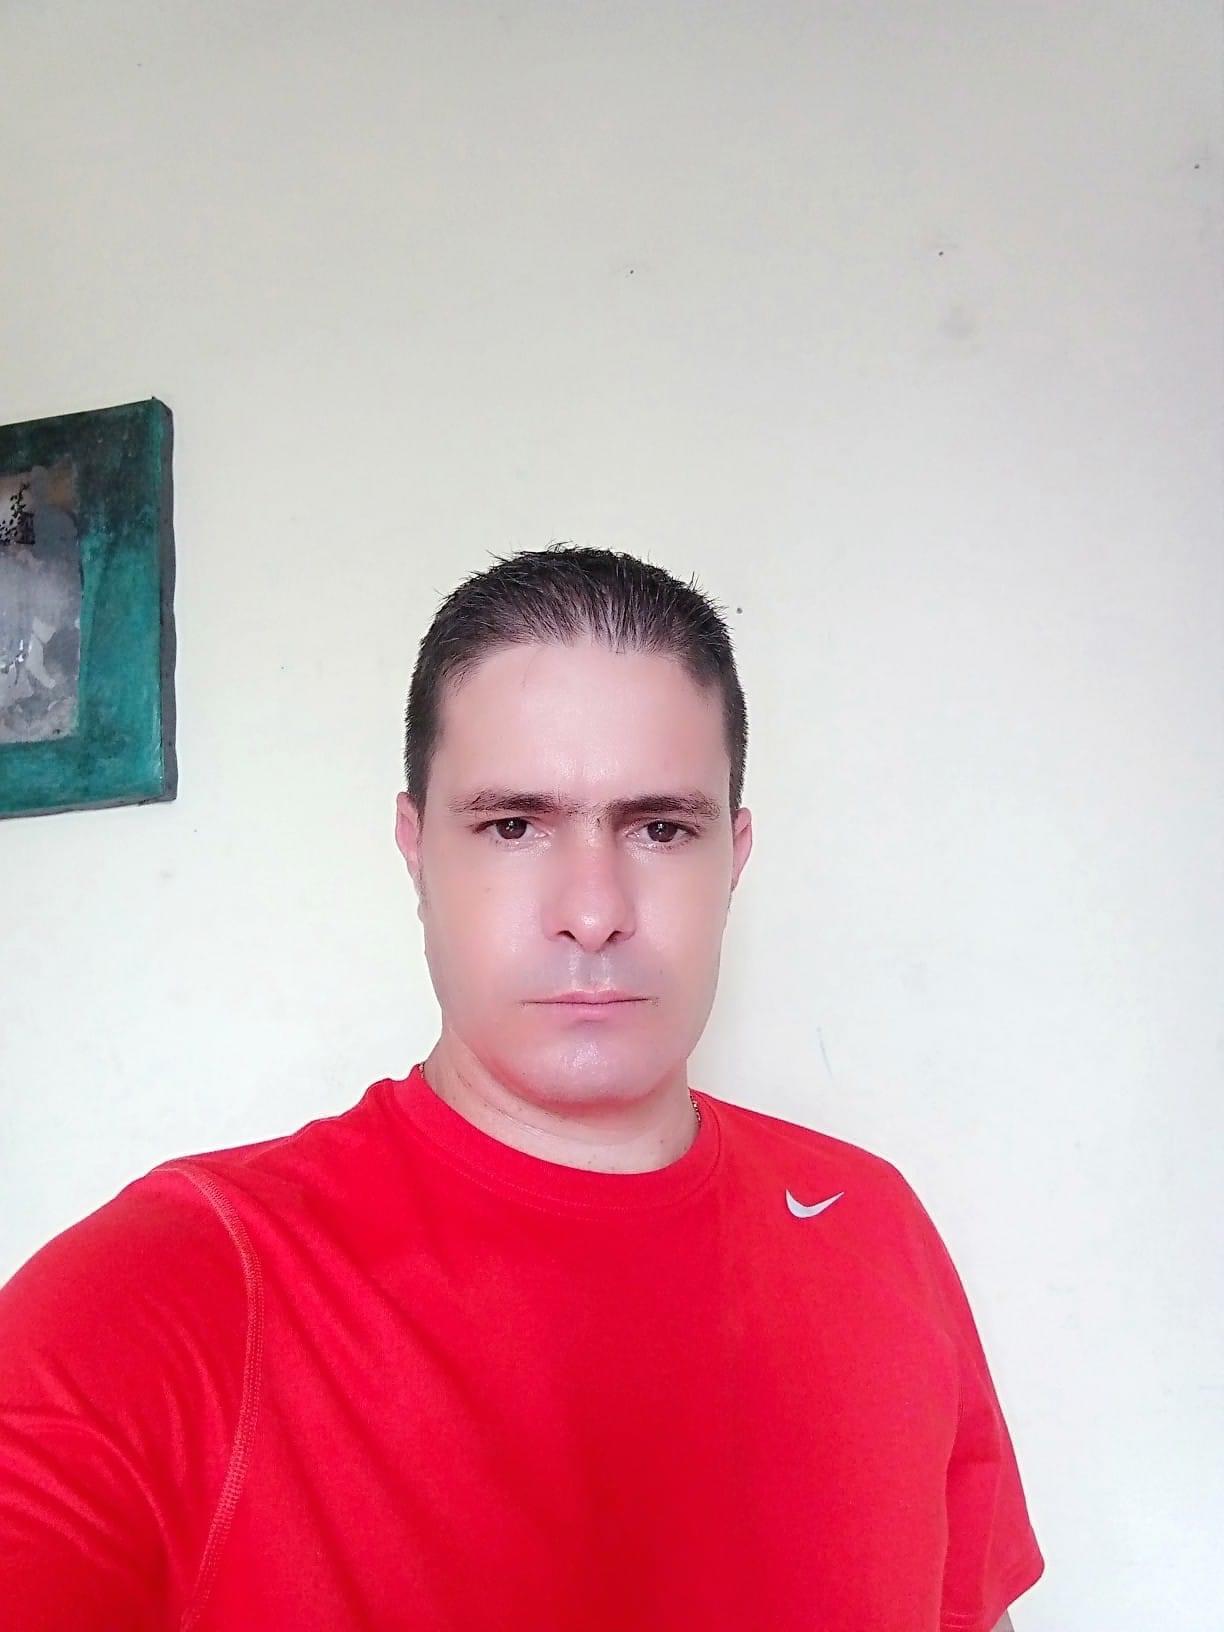 Alexander Quintero Lopez